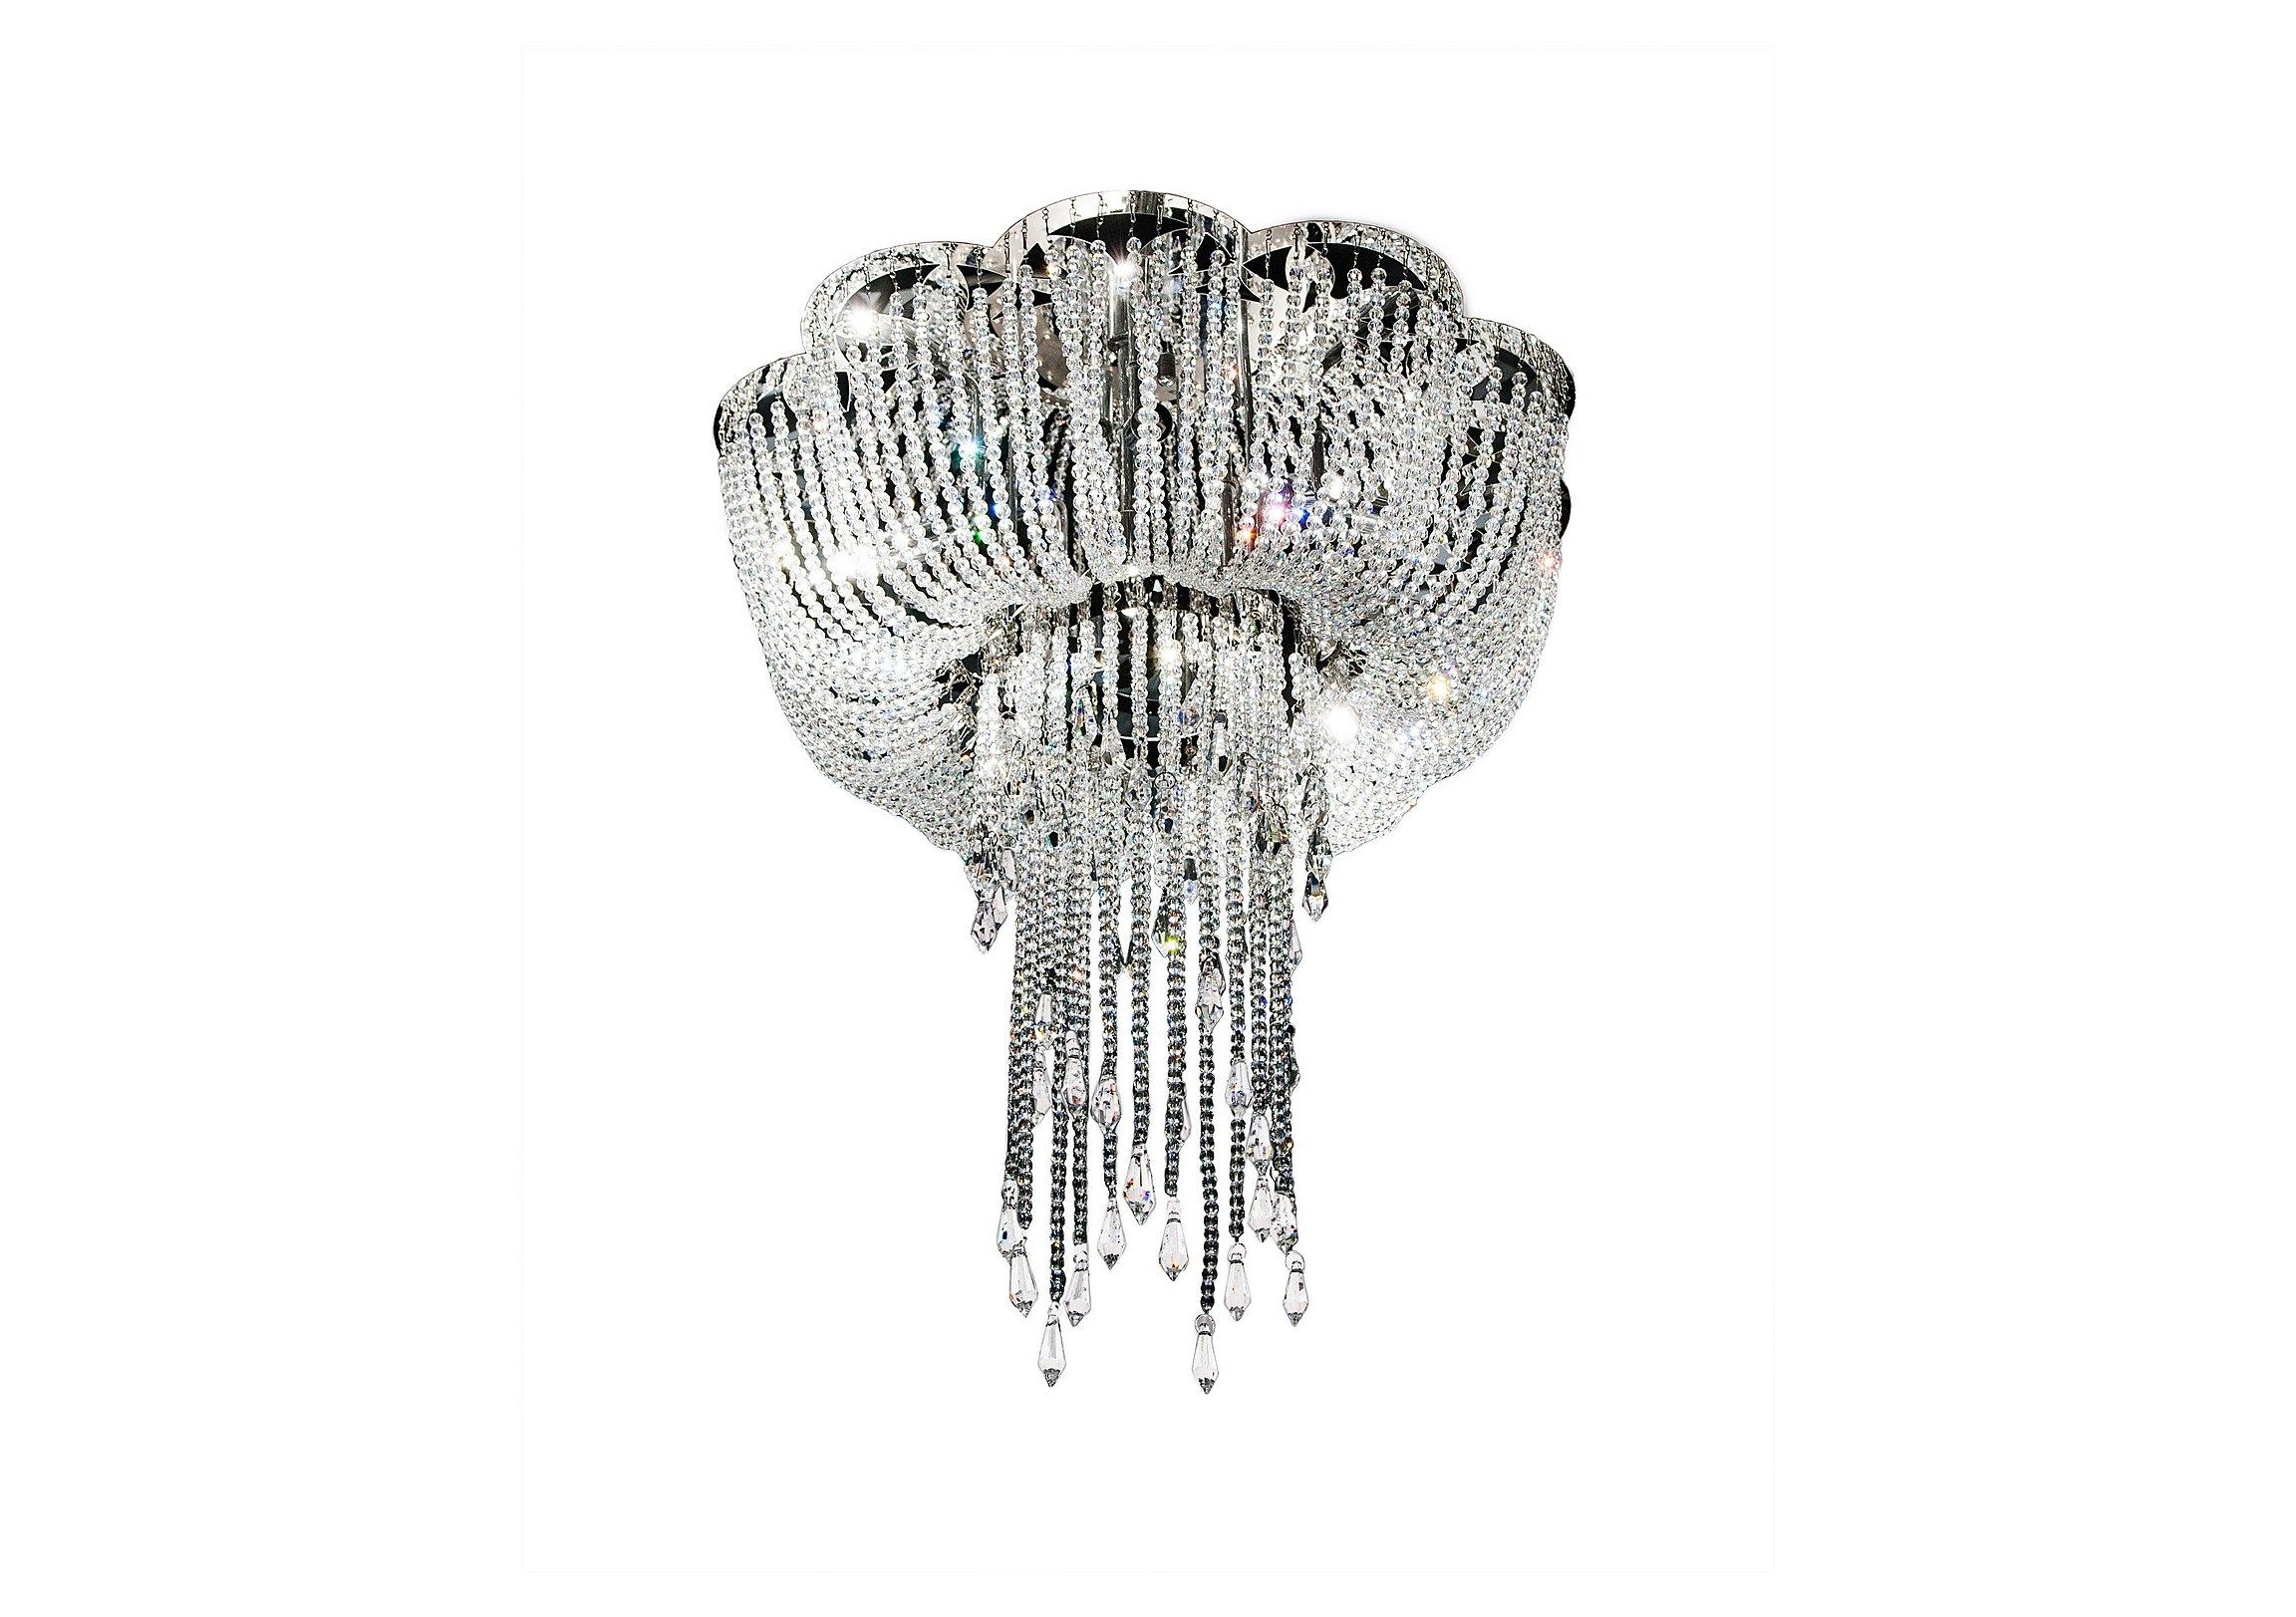 smsender ceilings crystal fixtures co tulum ceiling lights